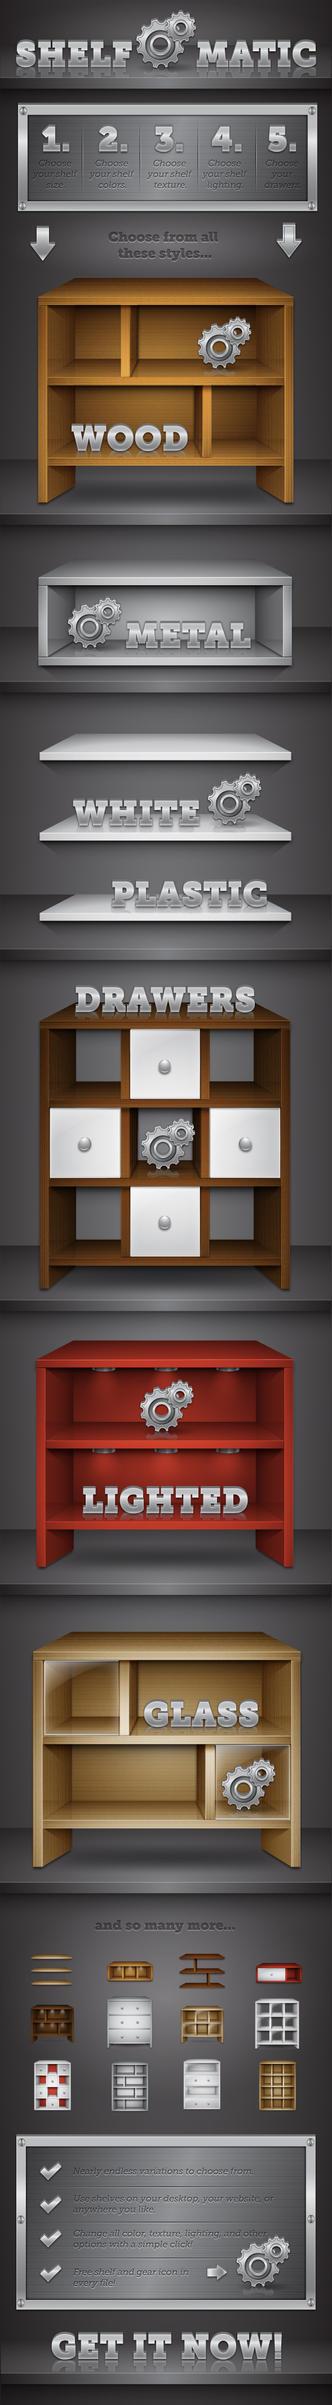 Shelf O' Matic by MelissaReneePohl